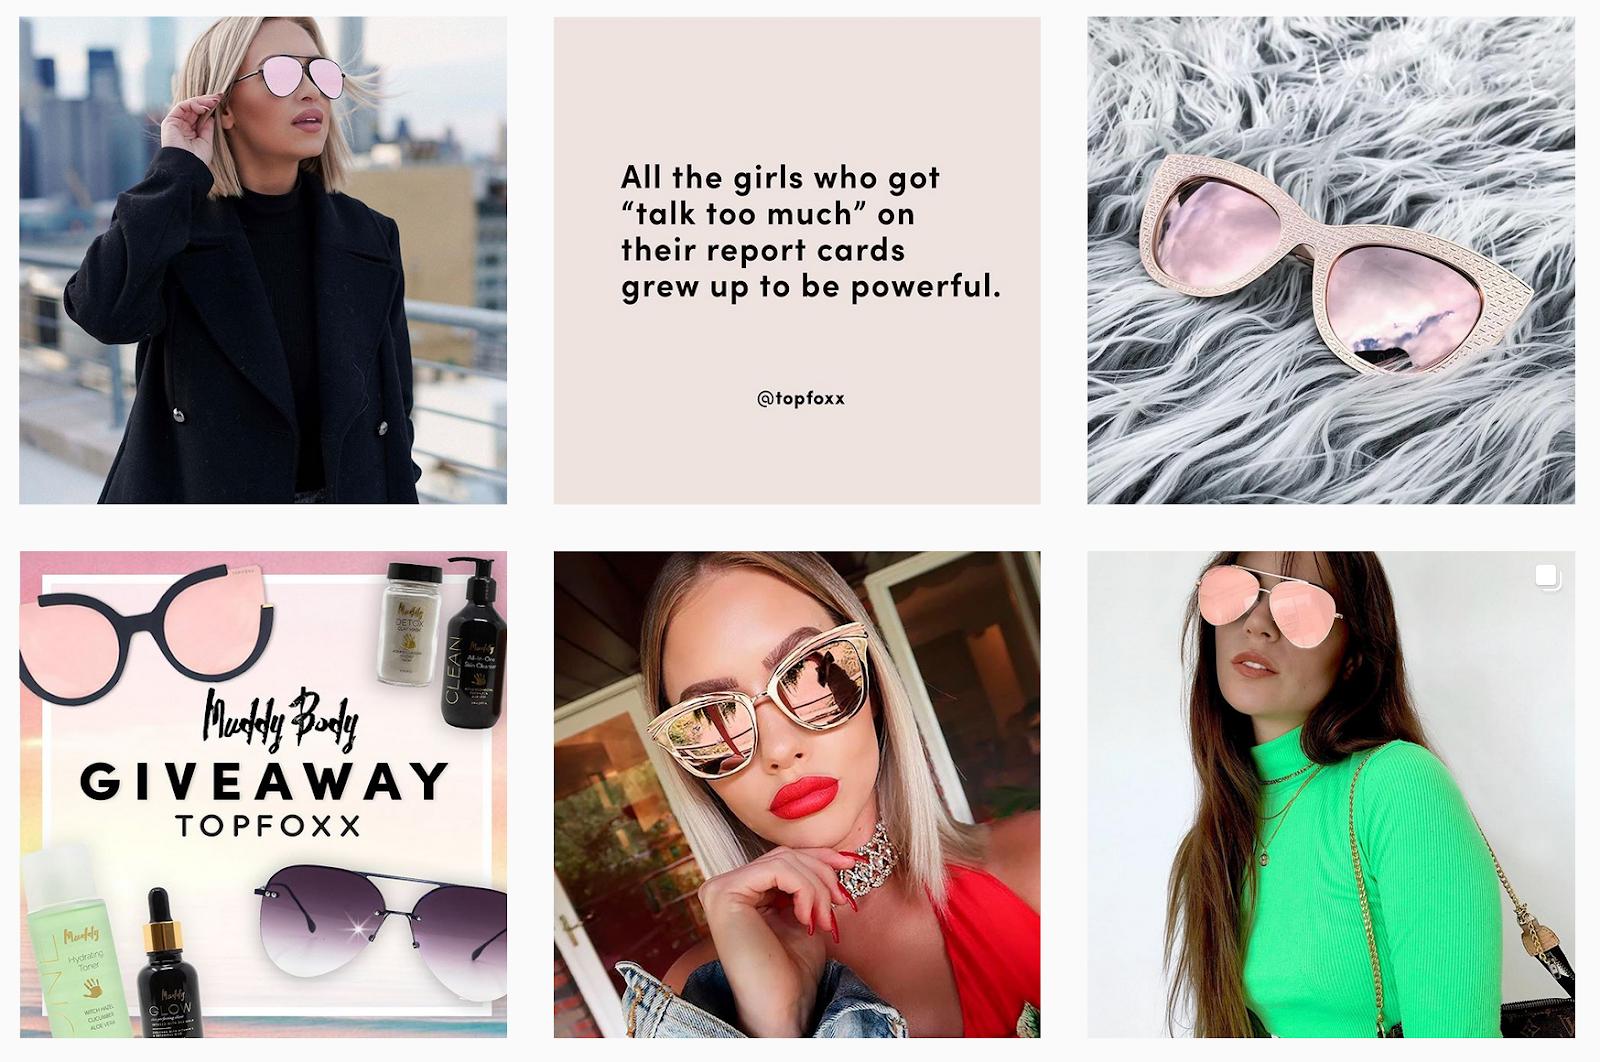 TopFoxx - Image Gallery Promoting Latest Eyewear